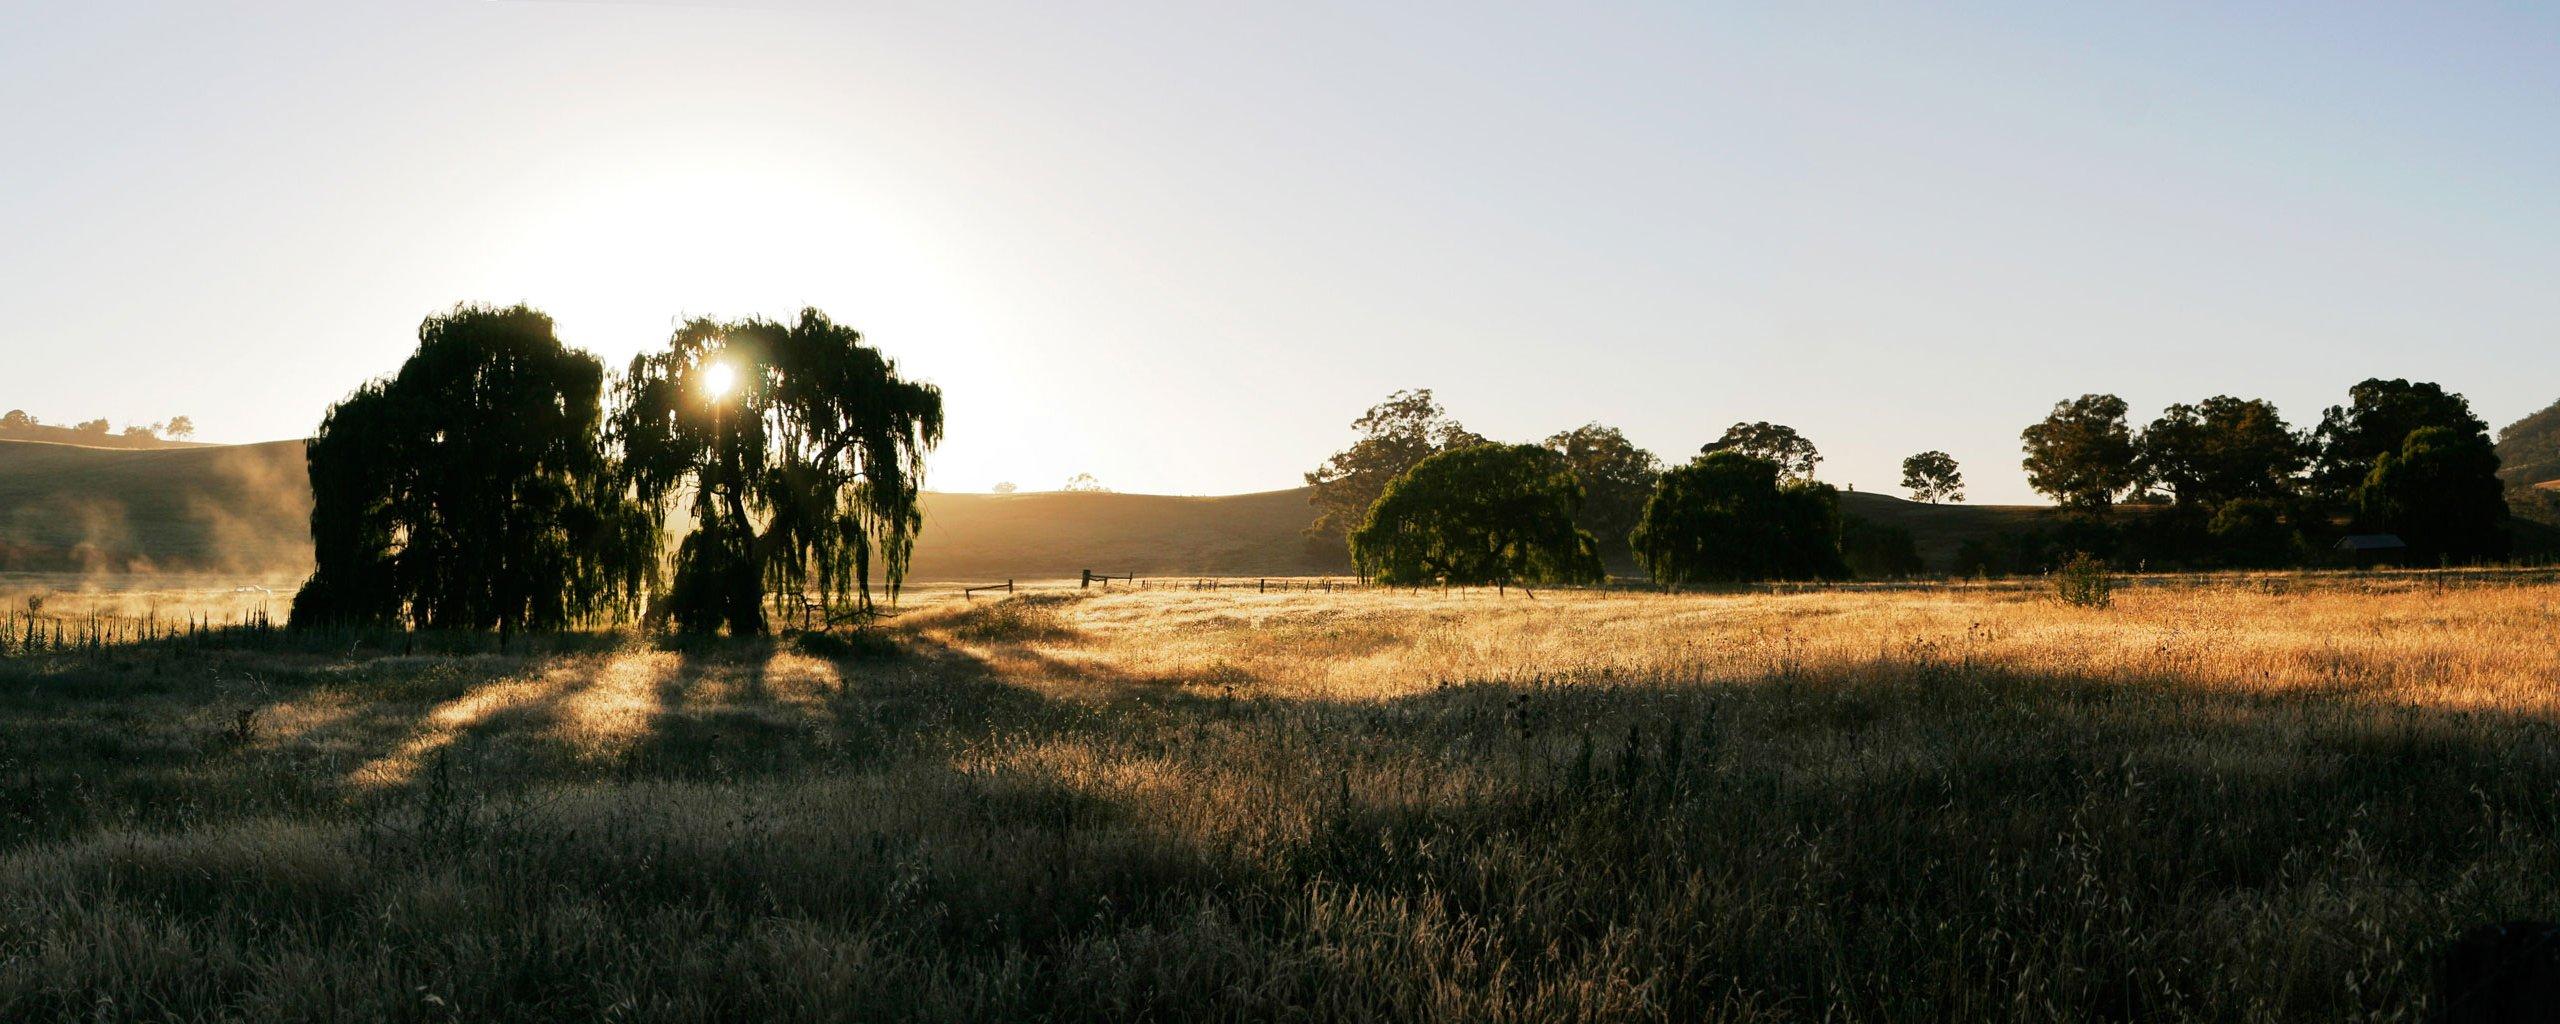 Dawn_at_swifts_creek_panorama